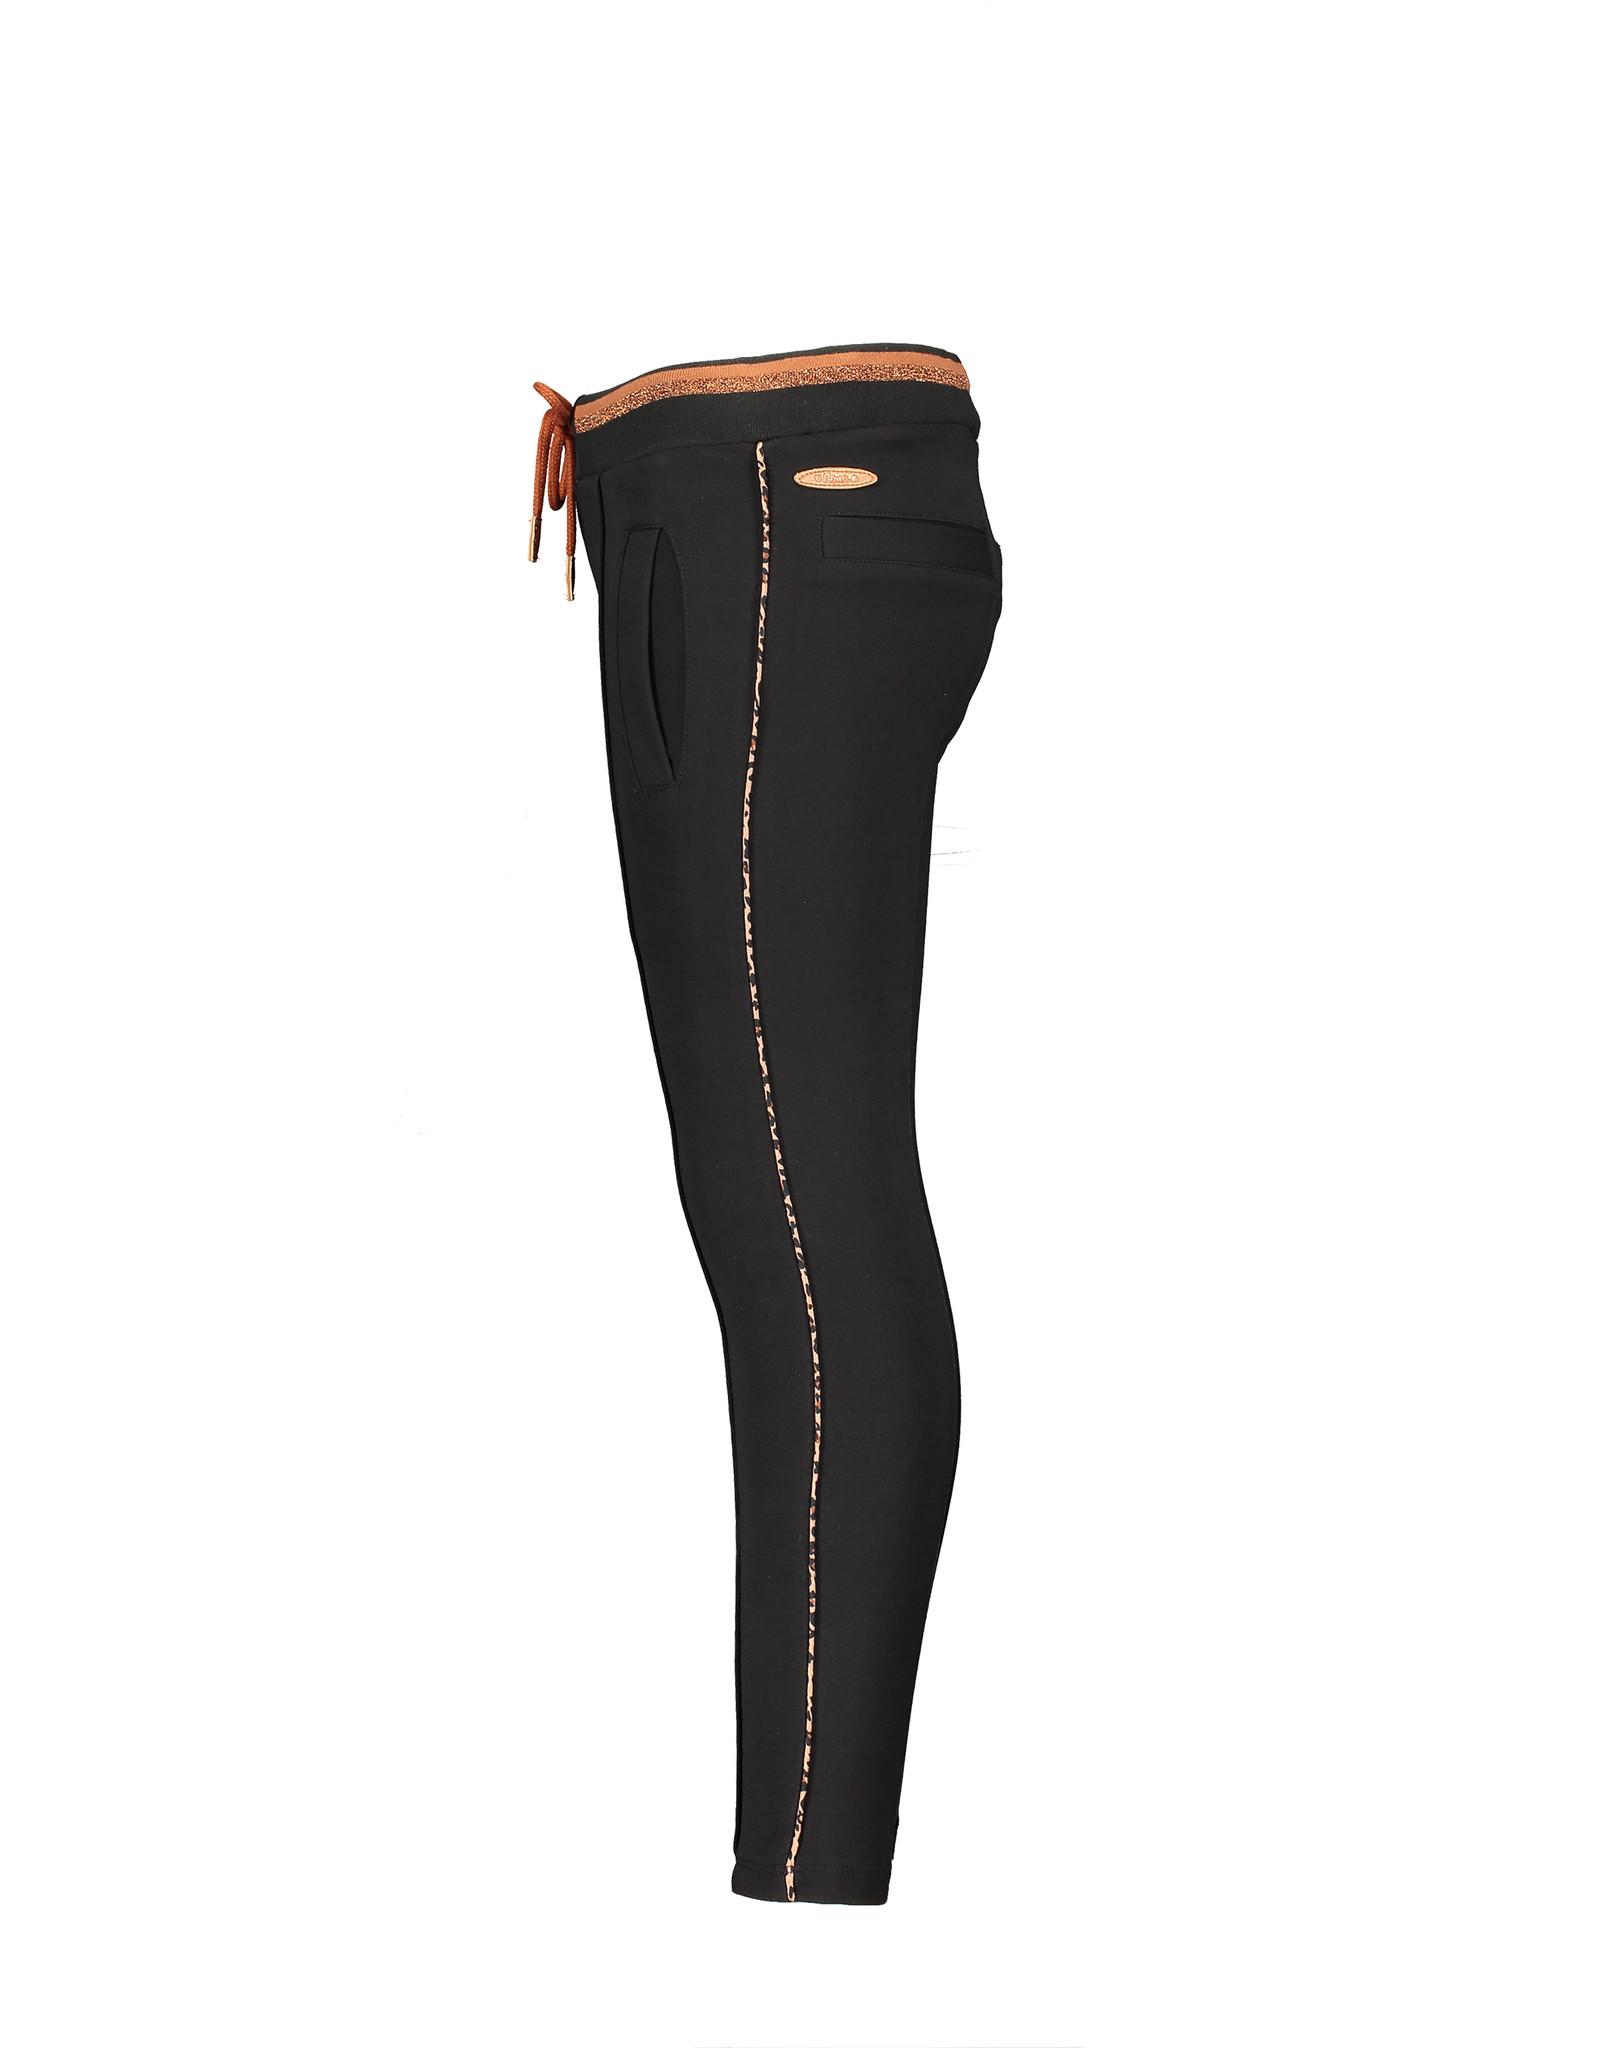 NONO NONO SeclerB Sweat pants with Leopard JET BLACK